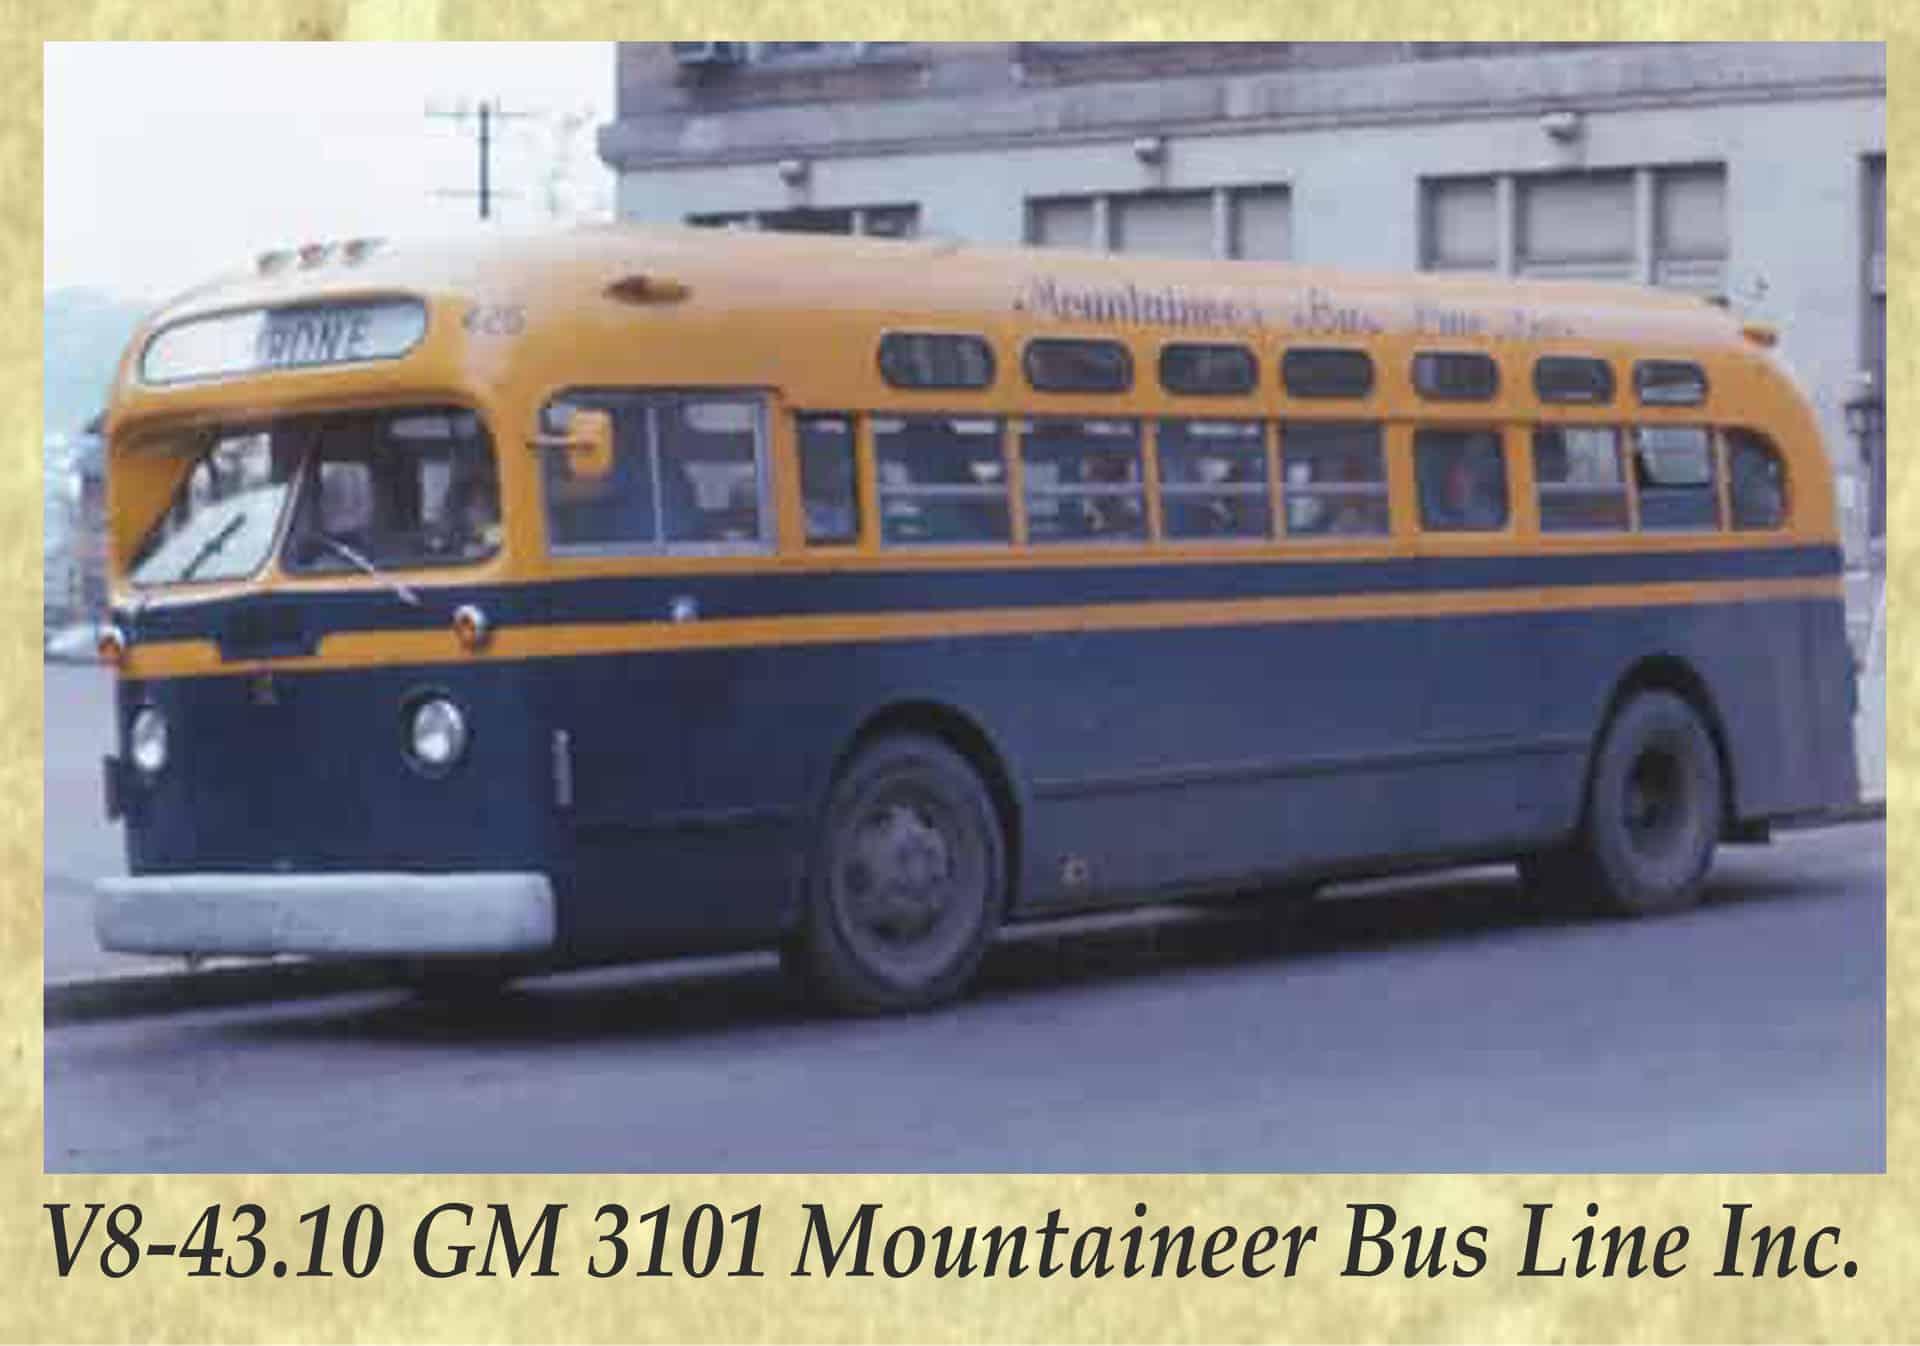 V8-43.10 GM 3101 Mountaineer Bus Line Inc.